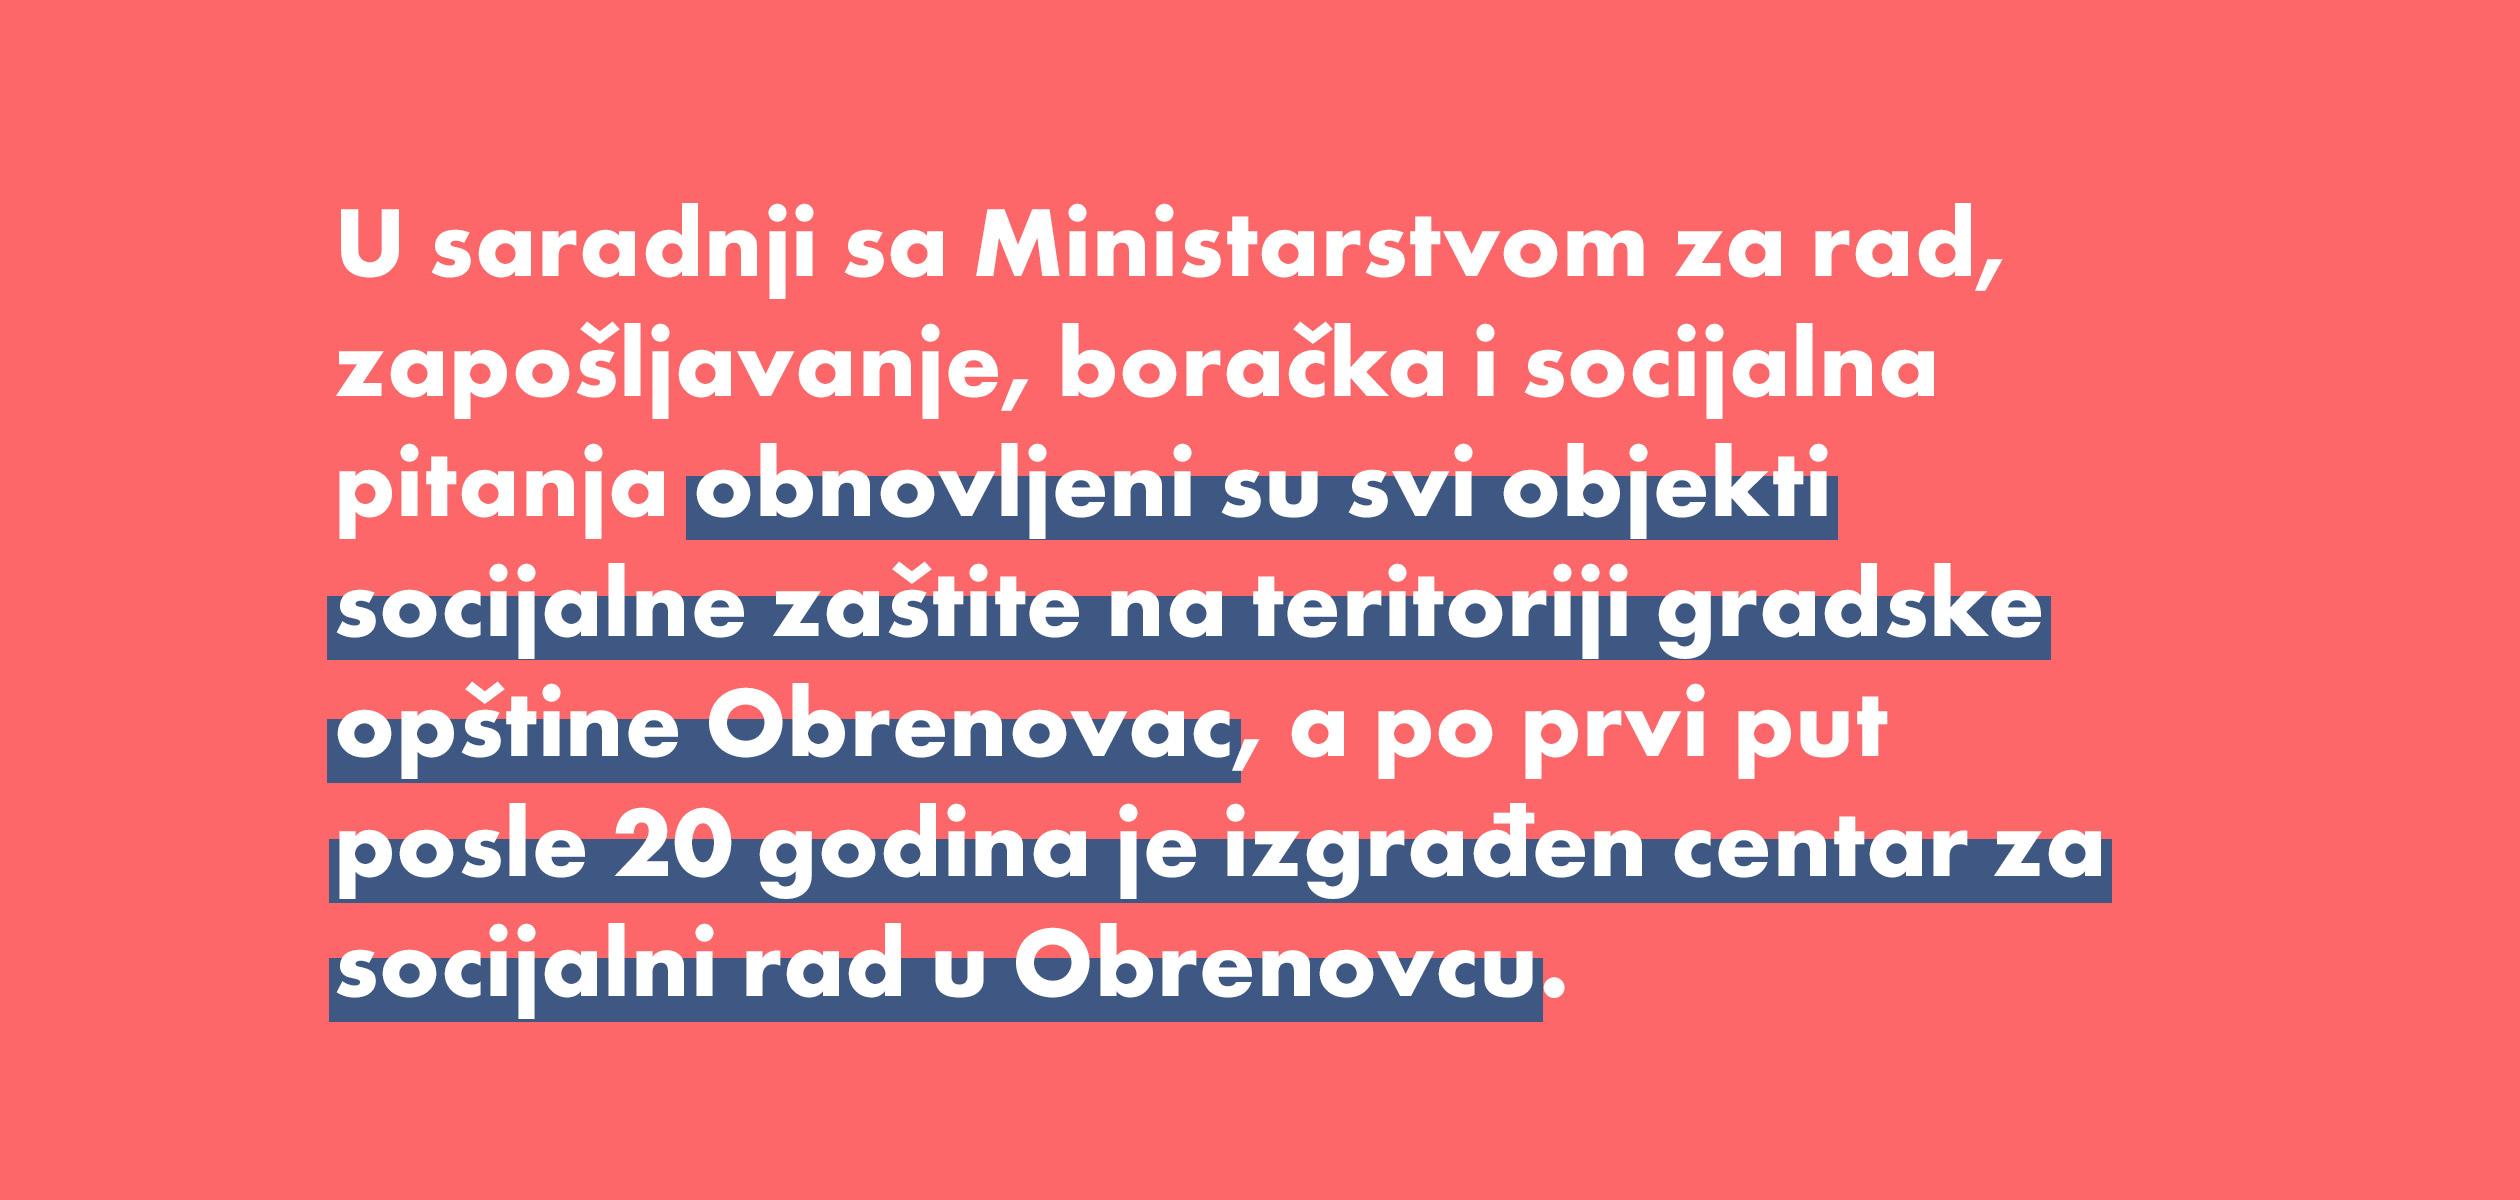 obnova-objekata-socijalne-zastite-opstina-obrenovac.jpg